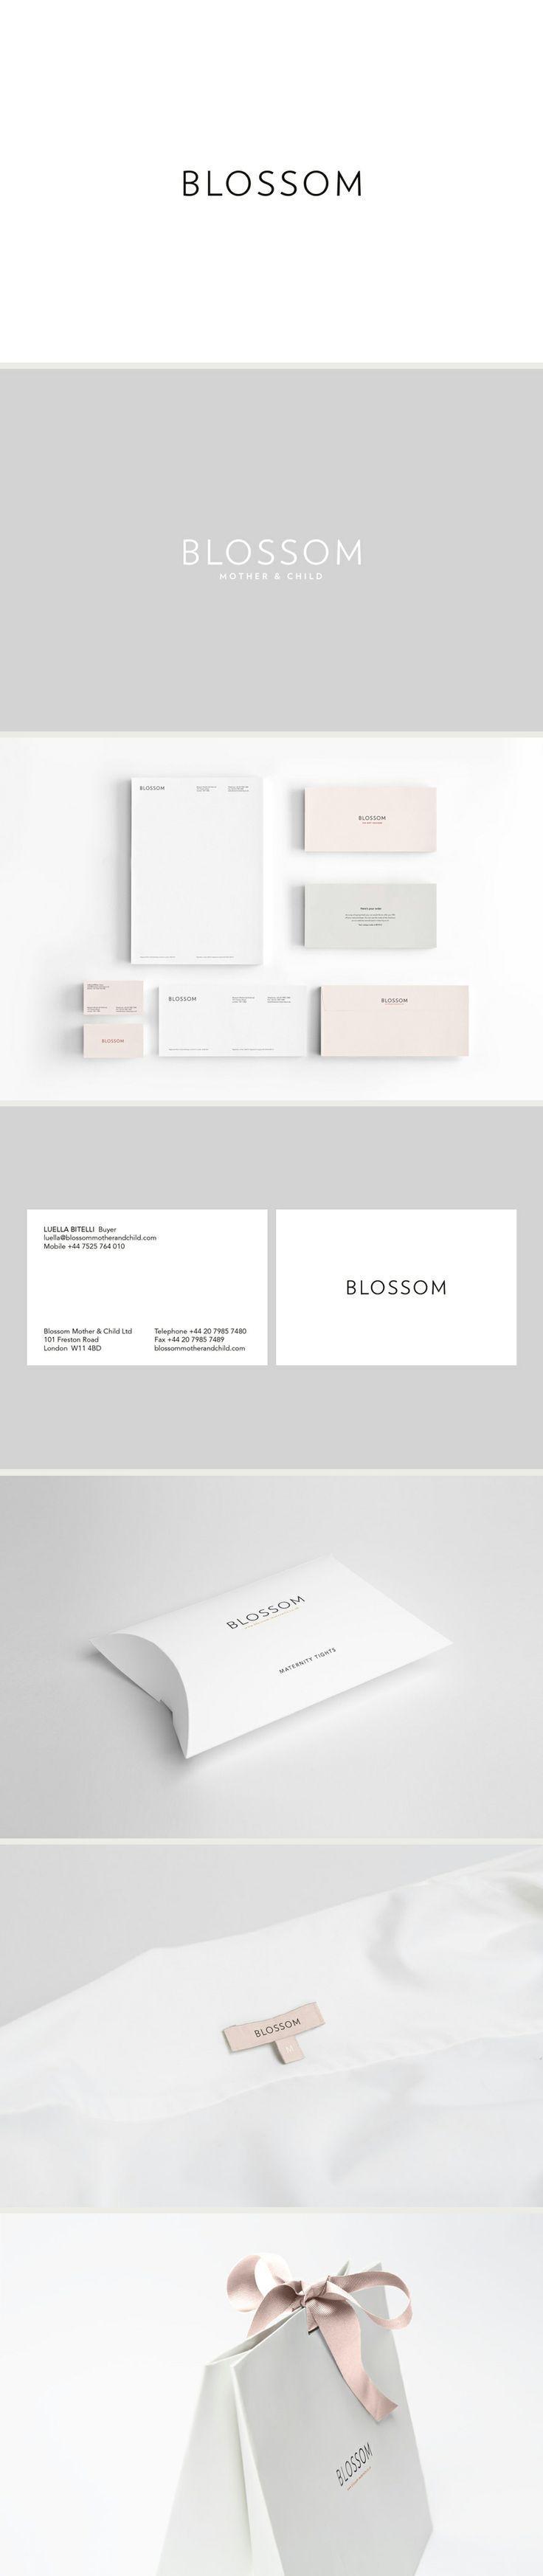 branding    identity    graphic design    blossom brand